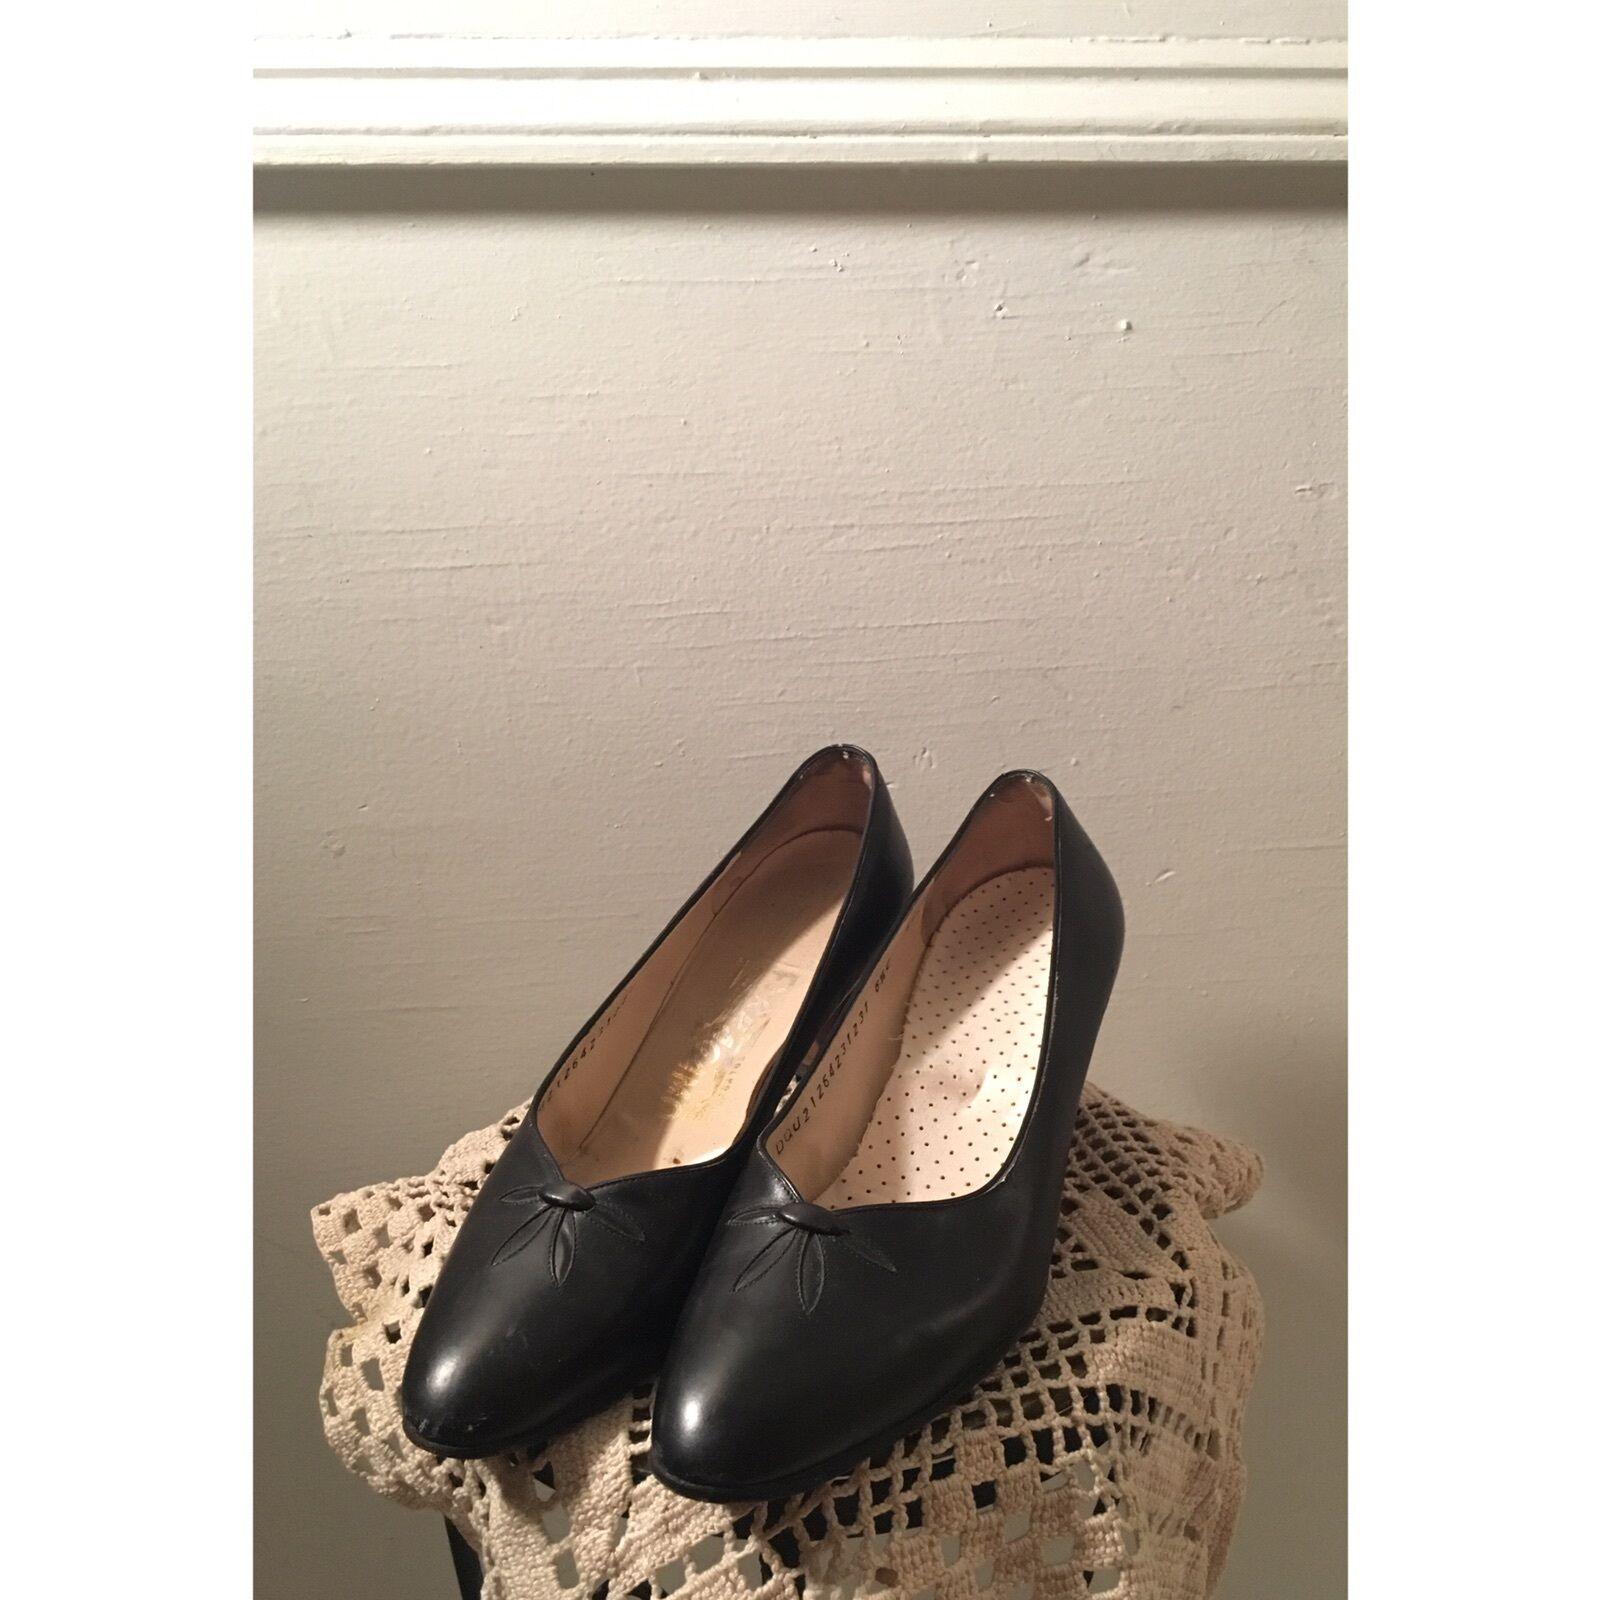 Salvatore Ferragamo Boutique Womens 6 1 2 Black Heels Italian Vintage